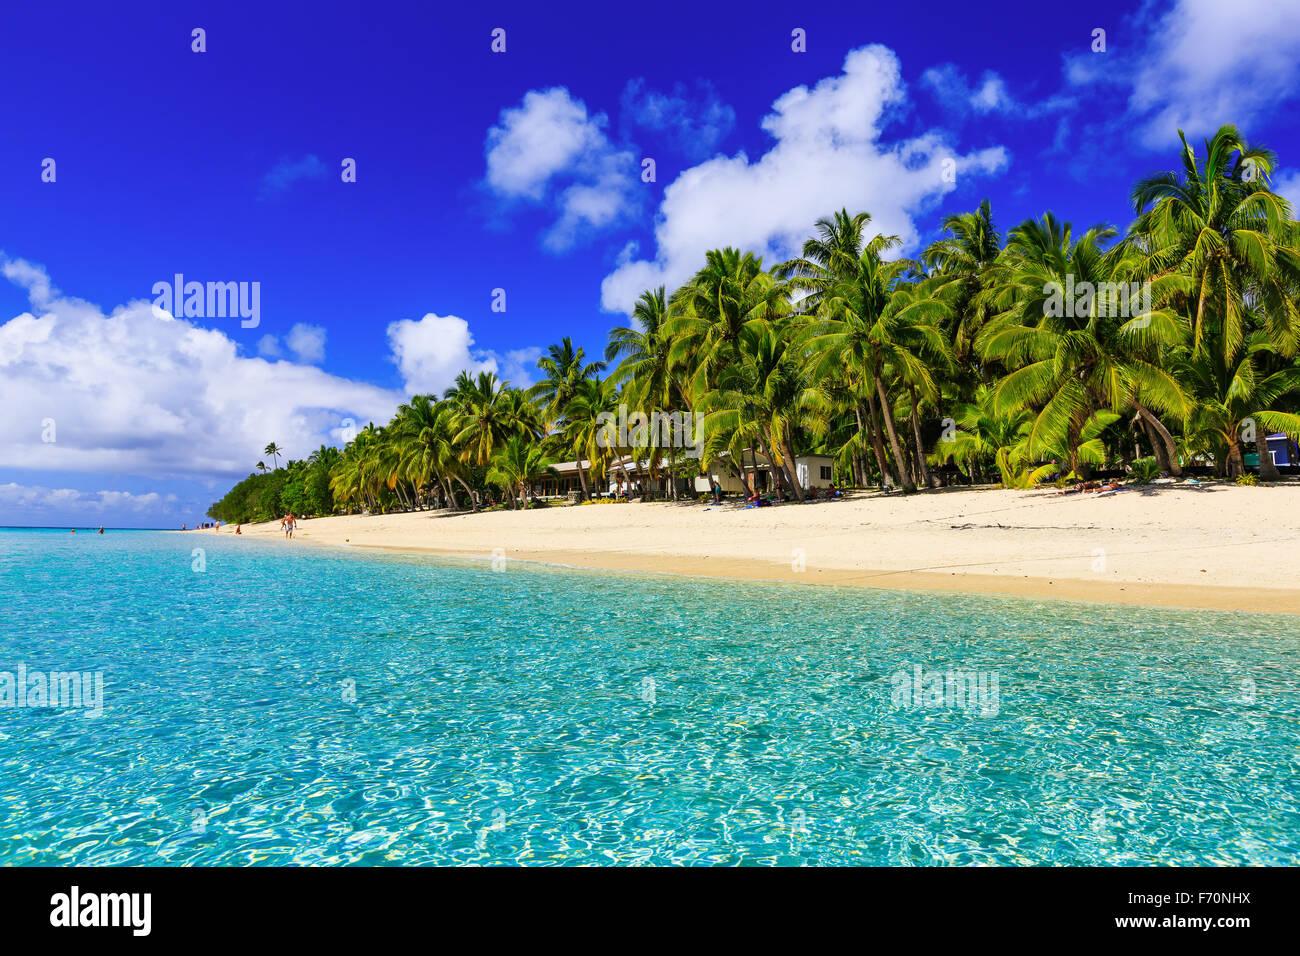 Playa de la isla tropical y aguas cristalinas. Dravuni Isla, Fiji. Imagen De Stock